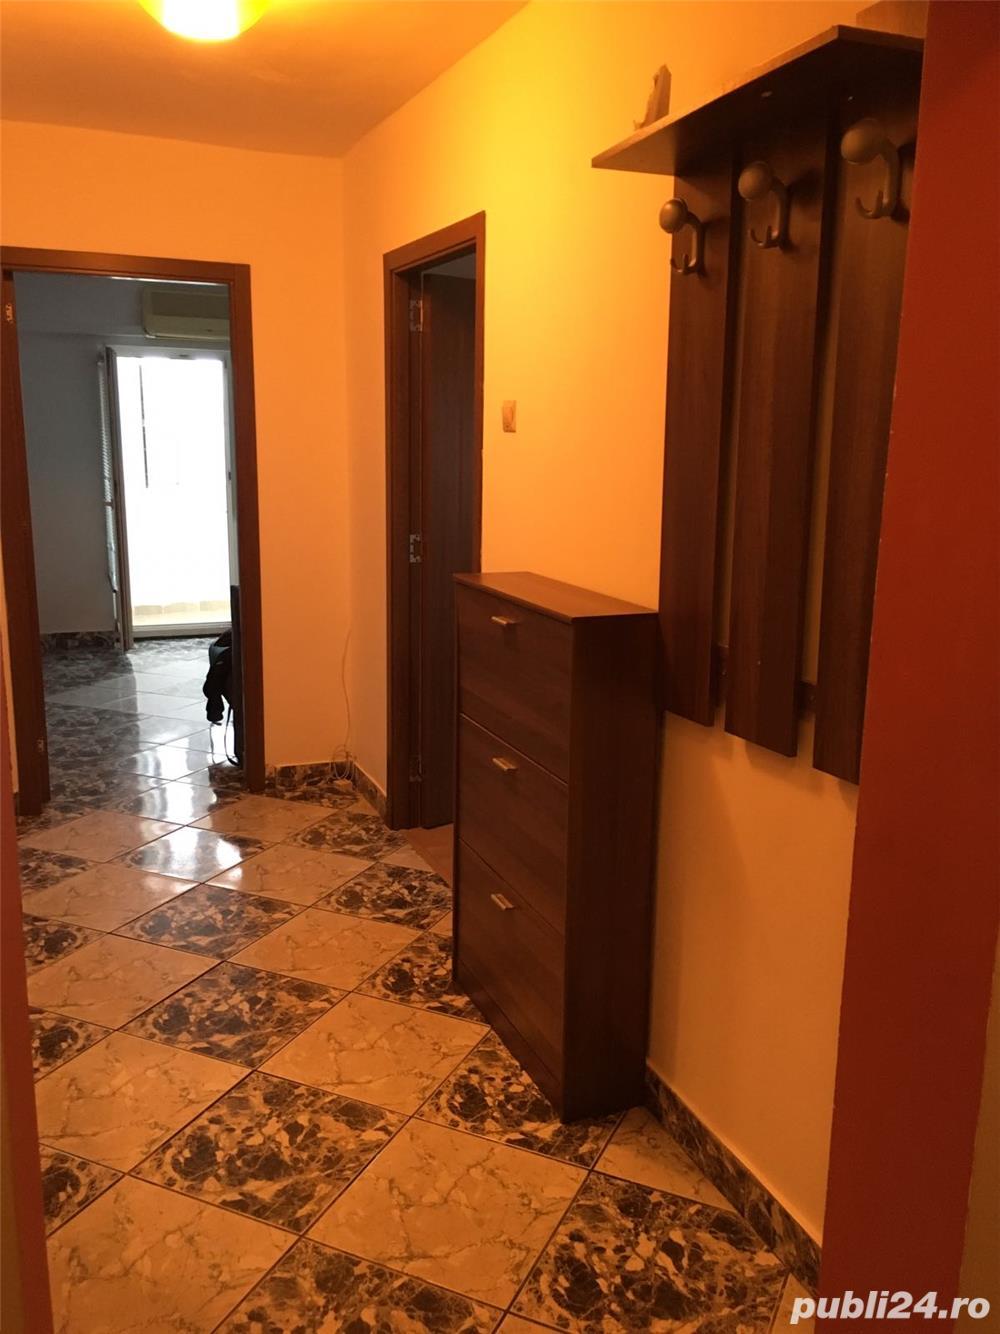 Particular, inchiriez apartament 2 camere in zona Tei, mobilat si utilat .Tel 0744166191